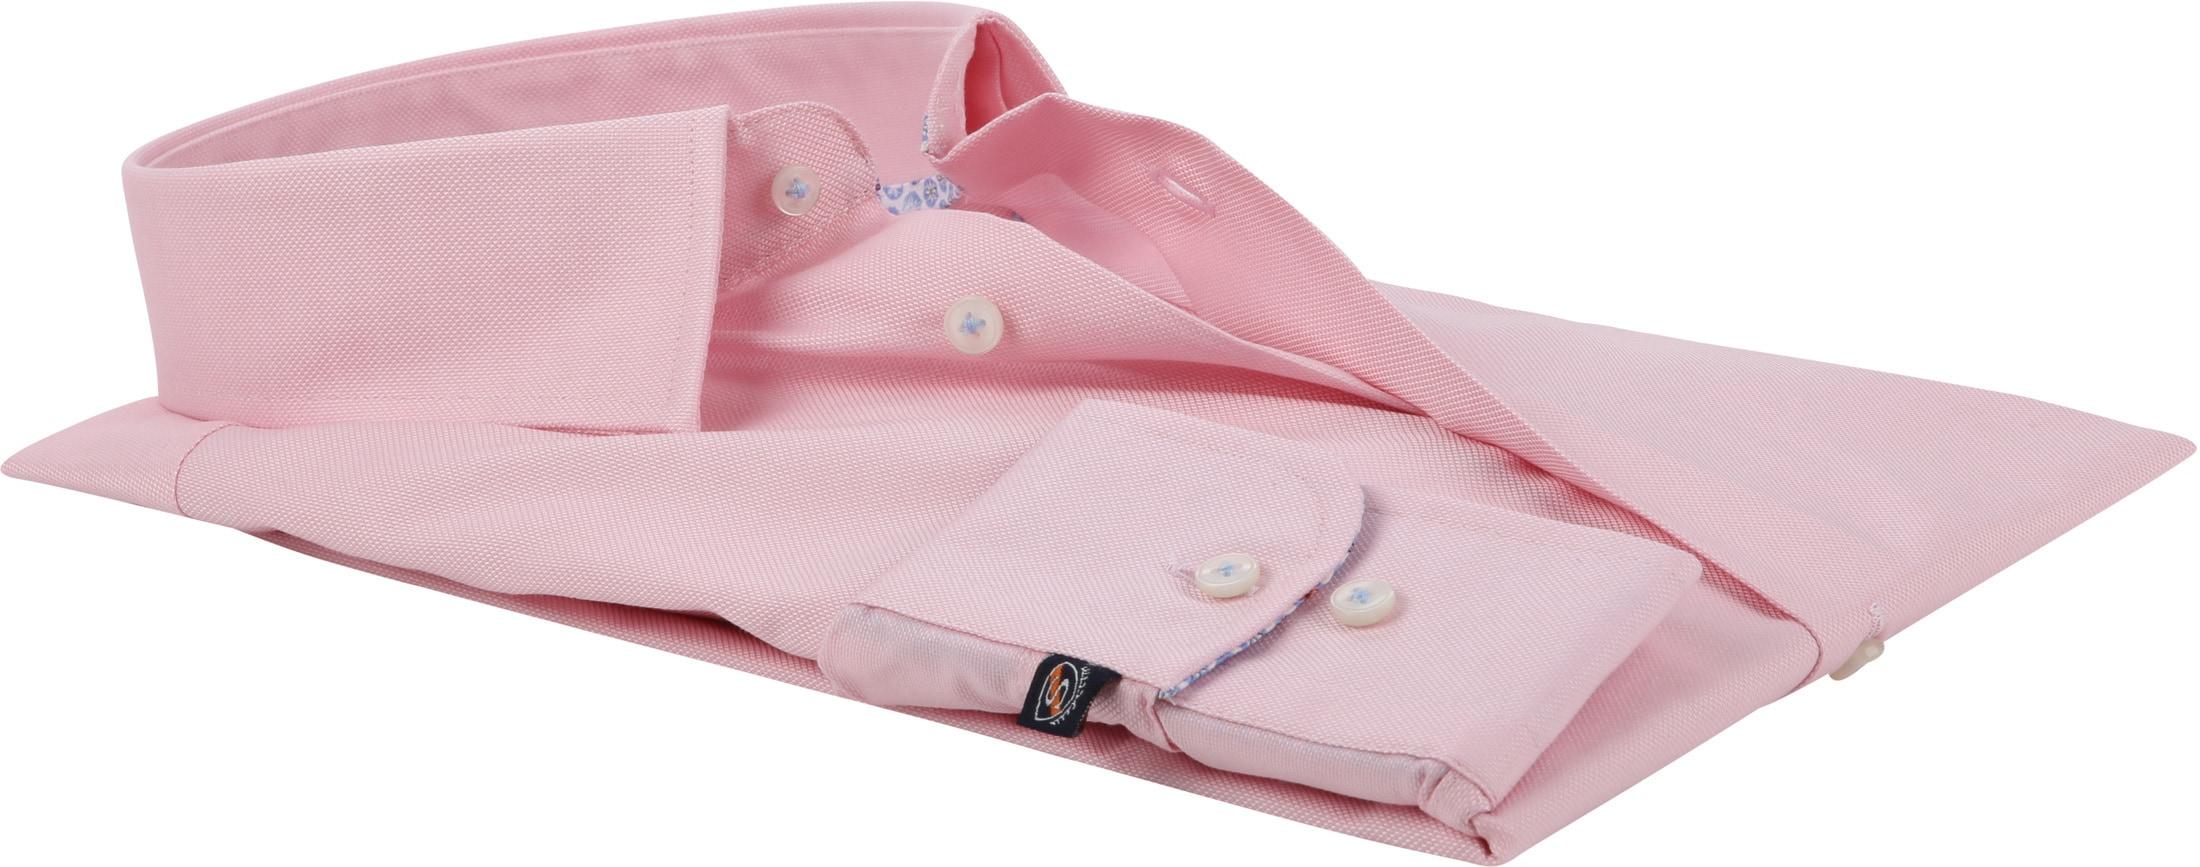 Suitable Shirt HBD Pink foto 3